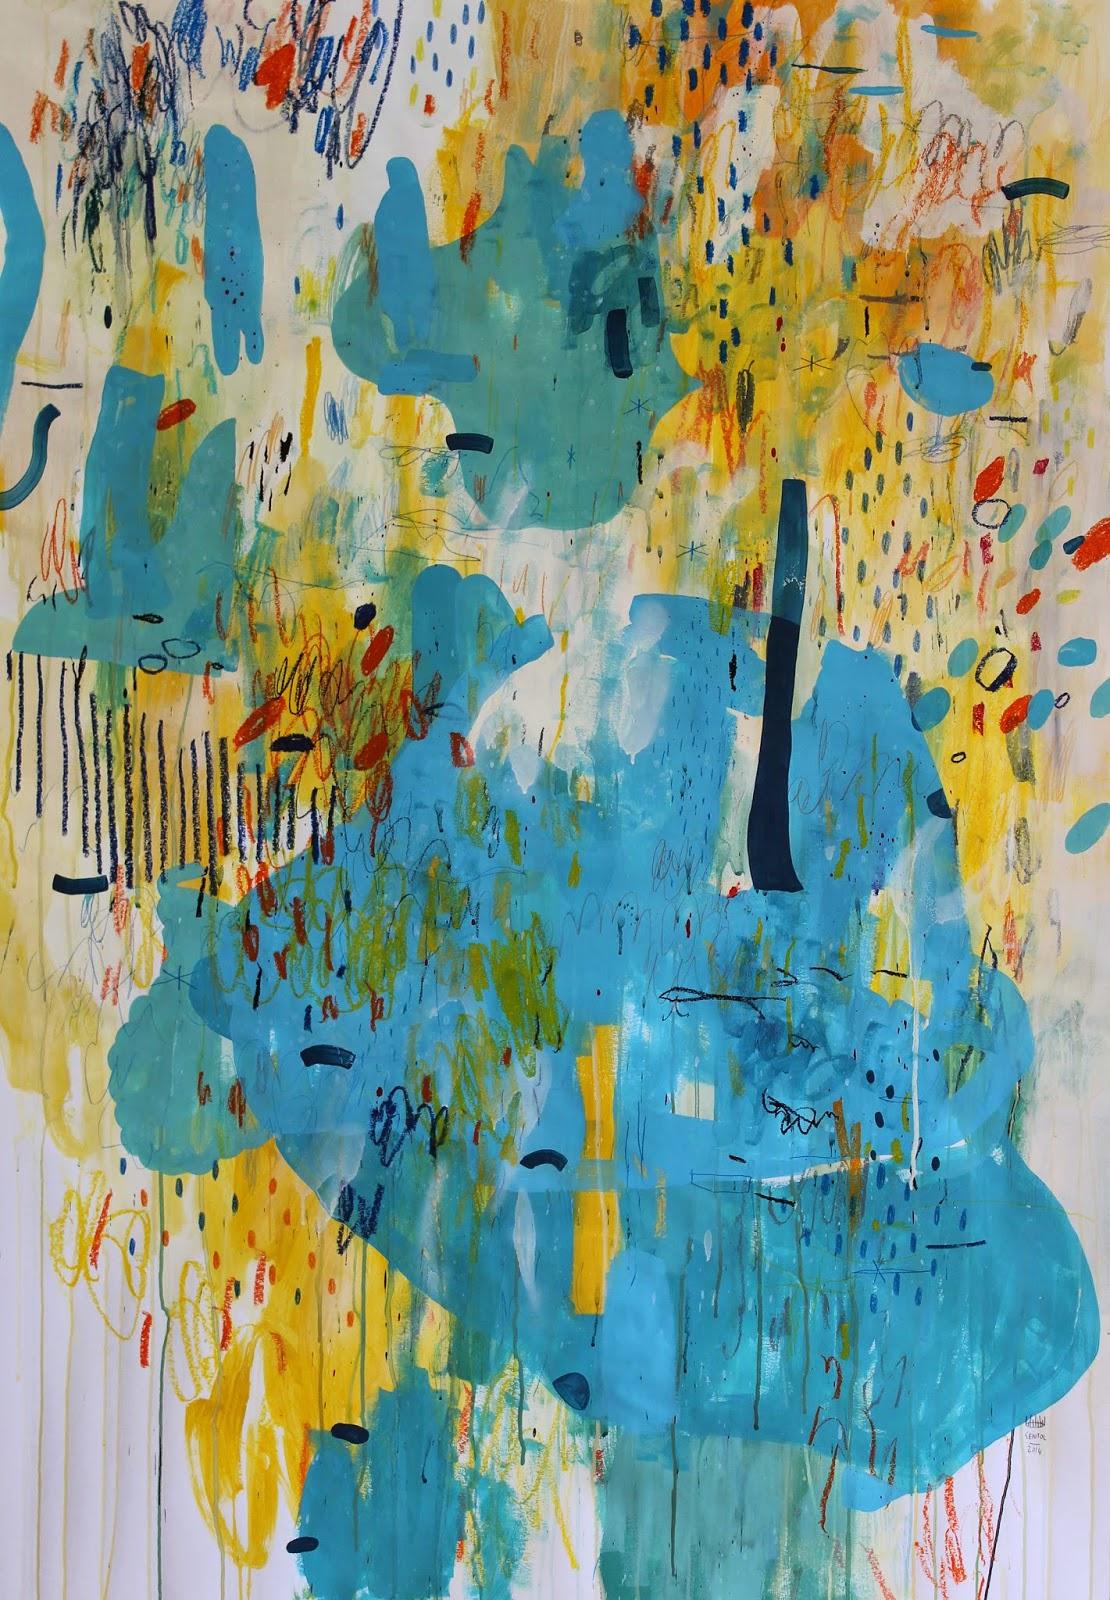 Passeth Through by Paul Senyol